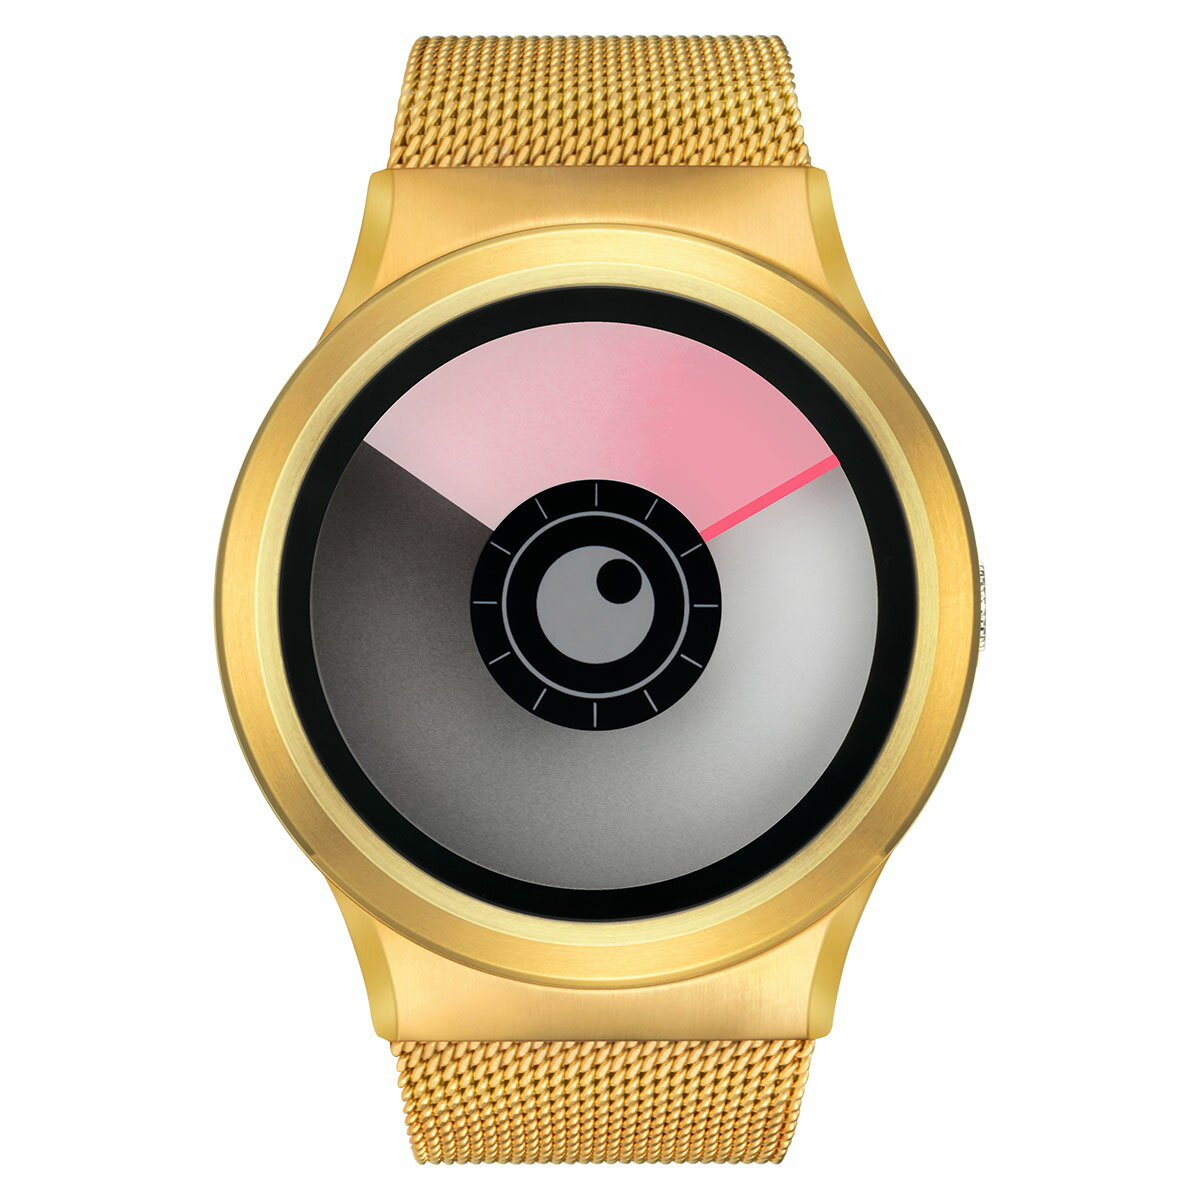 ZEROO AURORA BOREALIS ゼロ 電池式クォーツ 腕時計 [W12020B04SM04] ピンク デザインウォッチ ペア用 メンズ レディース ユニセックス おしゃれ時計 デザイナーズ